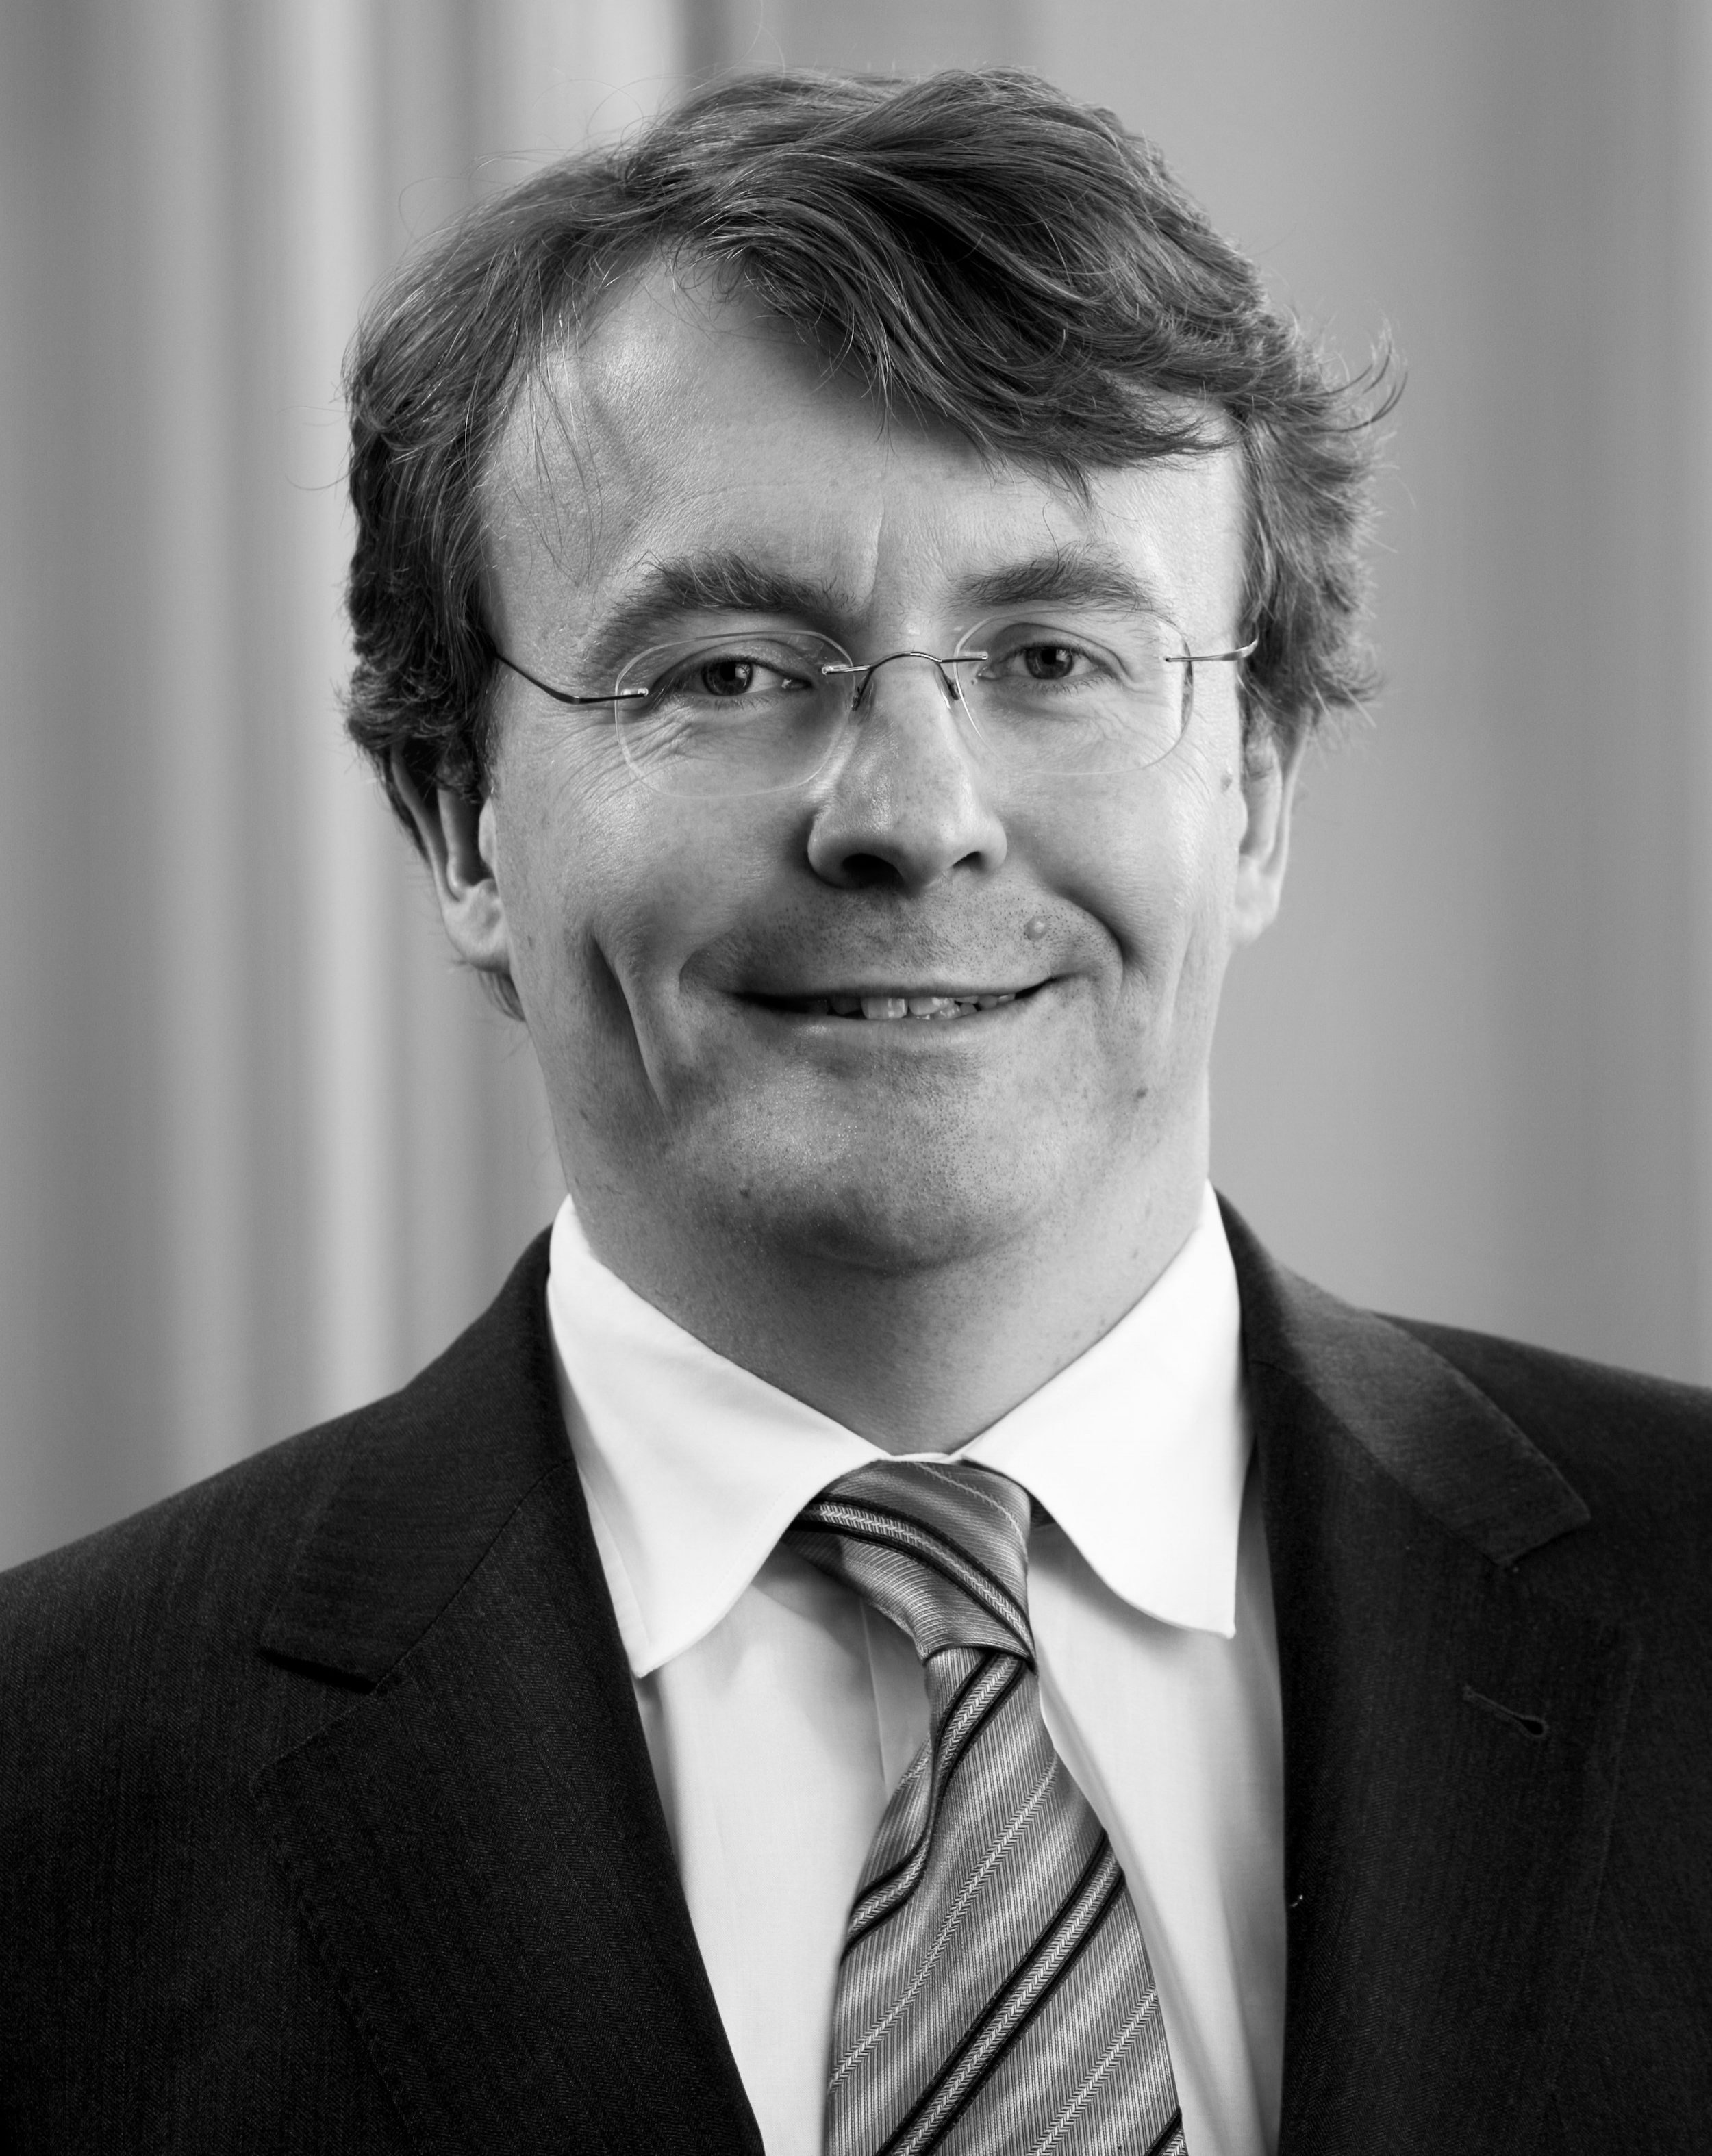 Prinz Friso der Niederlande (*1968-2013)   Foto: RVD